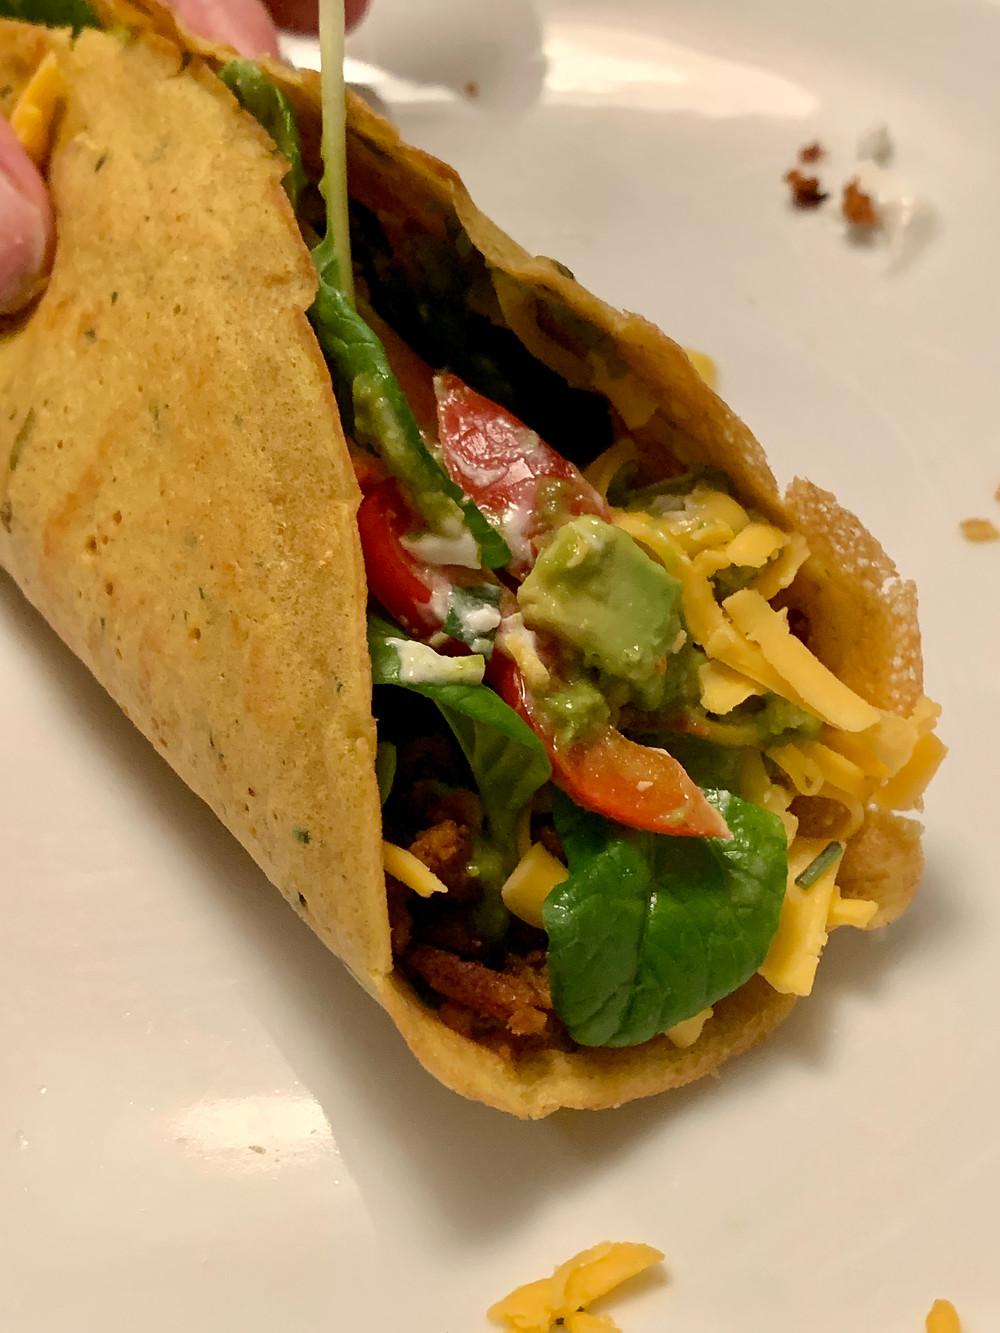 Epicure Easy Peasy Taco, Epicure cornbread mix